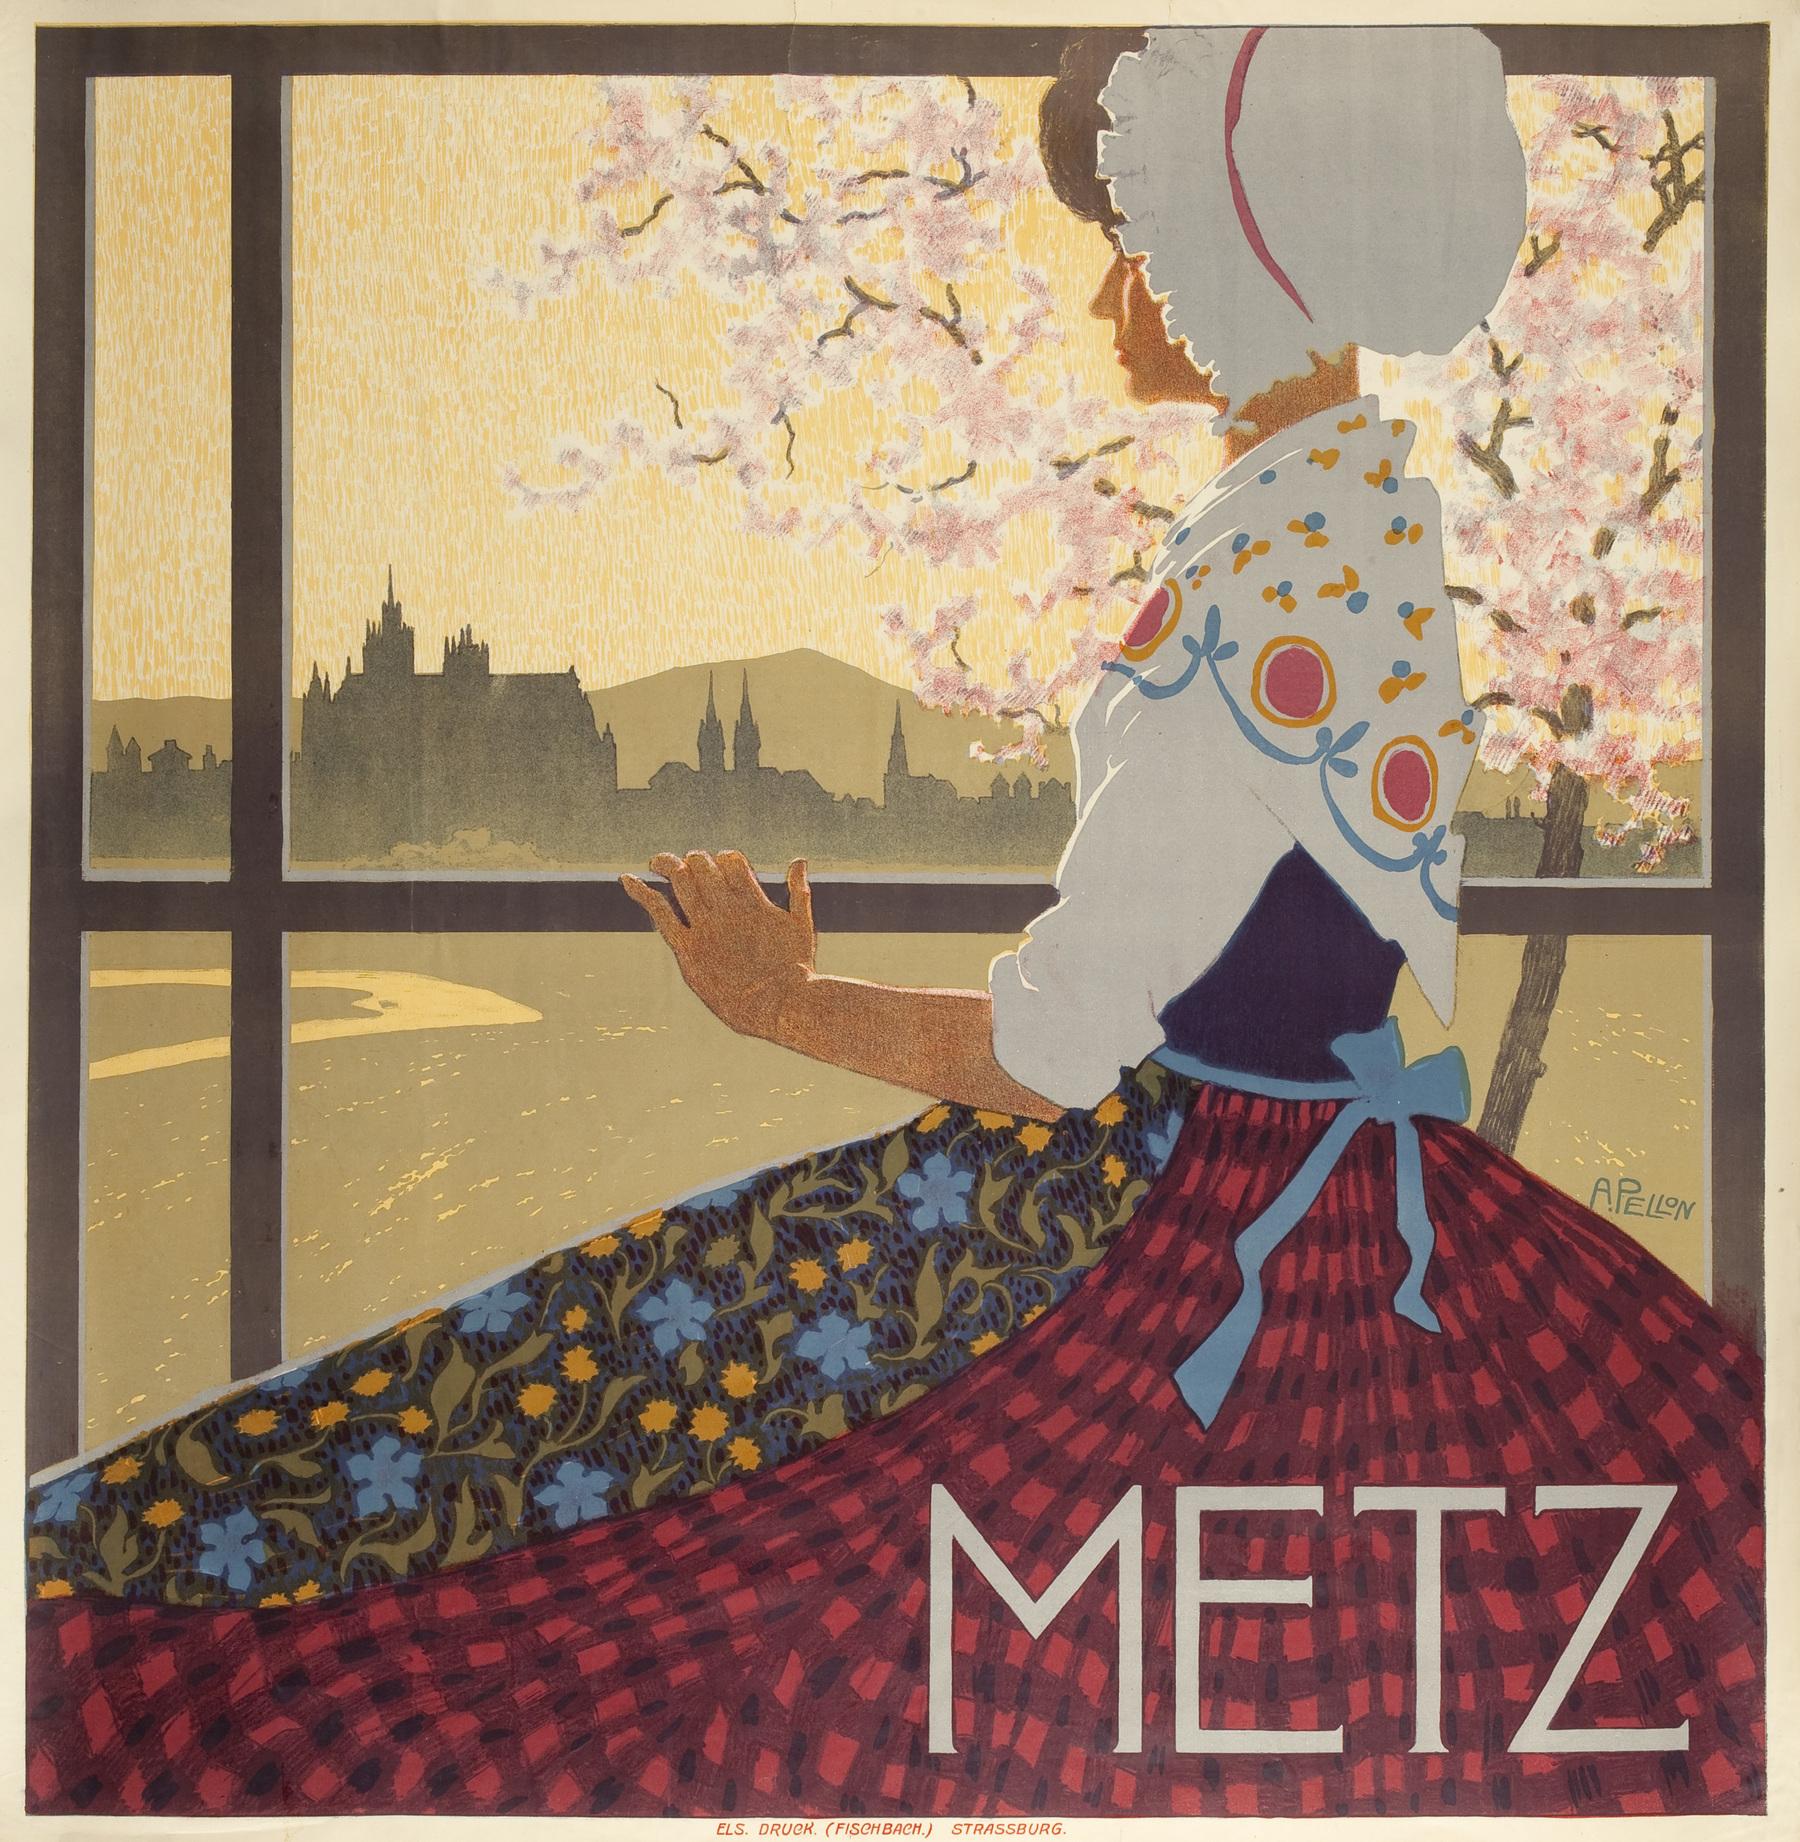 Contenu du Metz